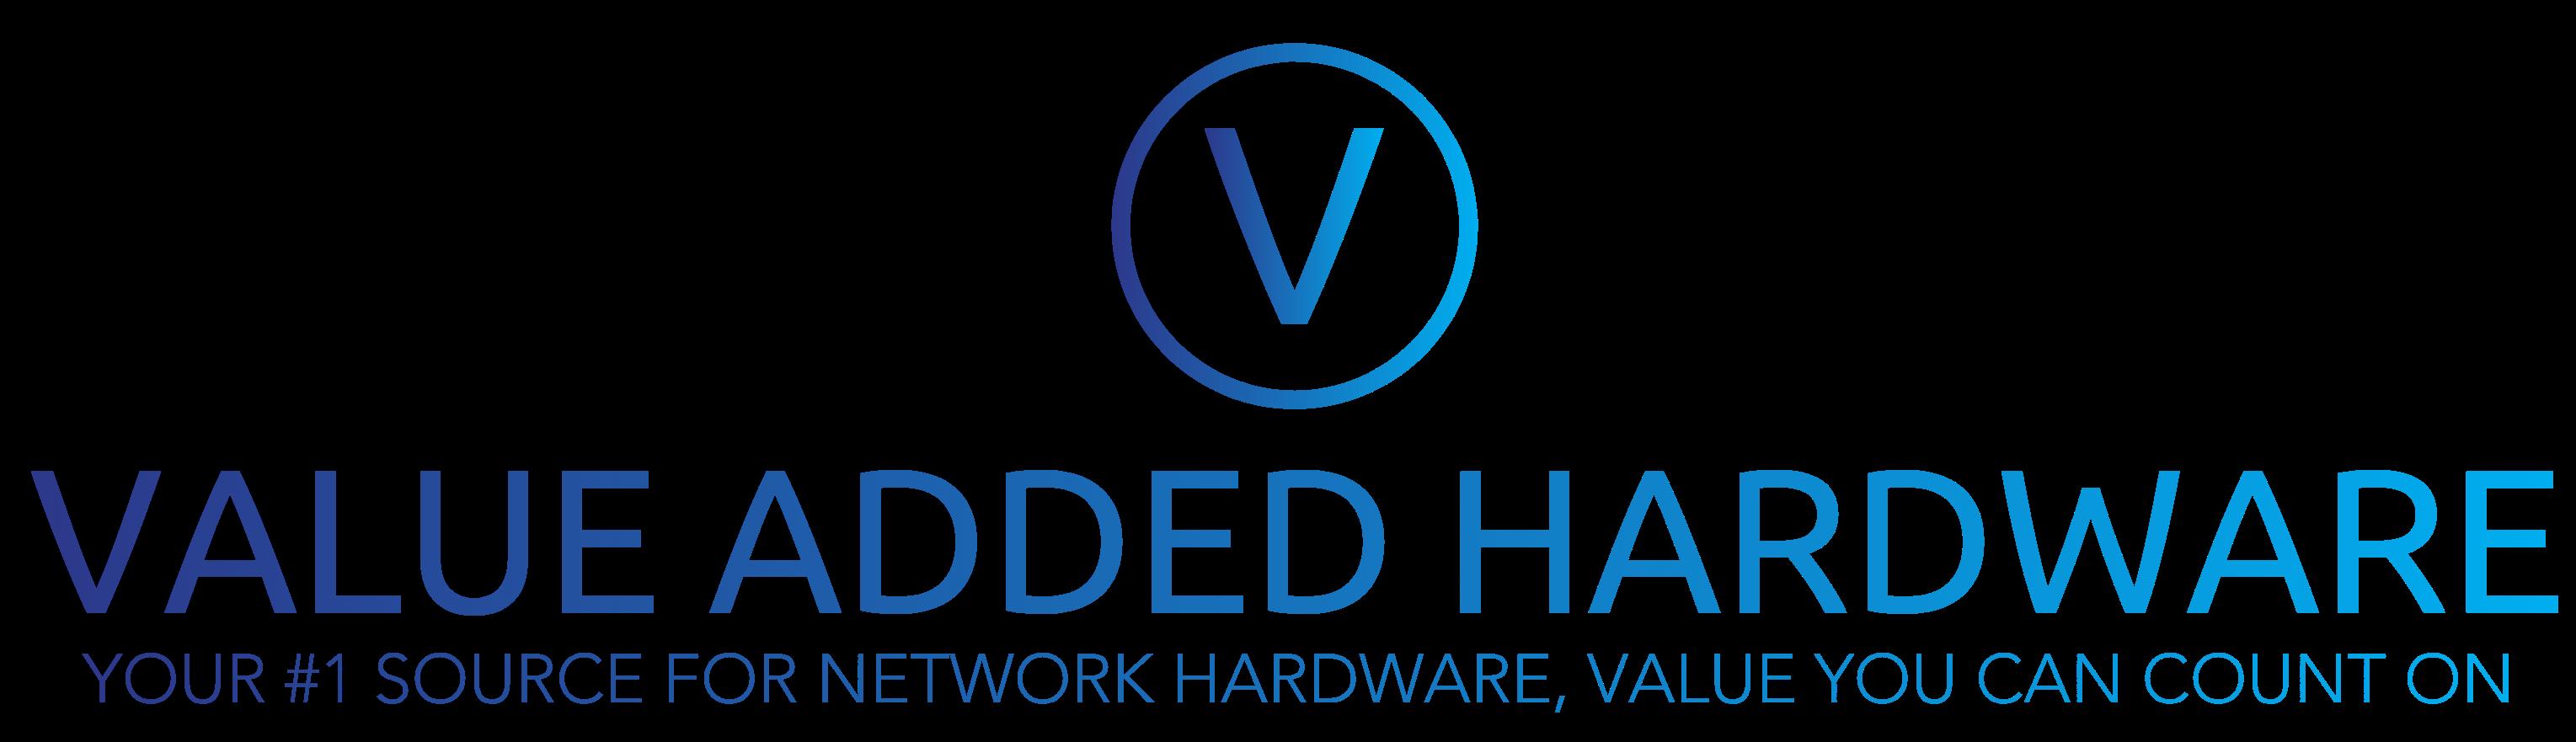 Valueaddedhardware.com